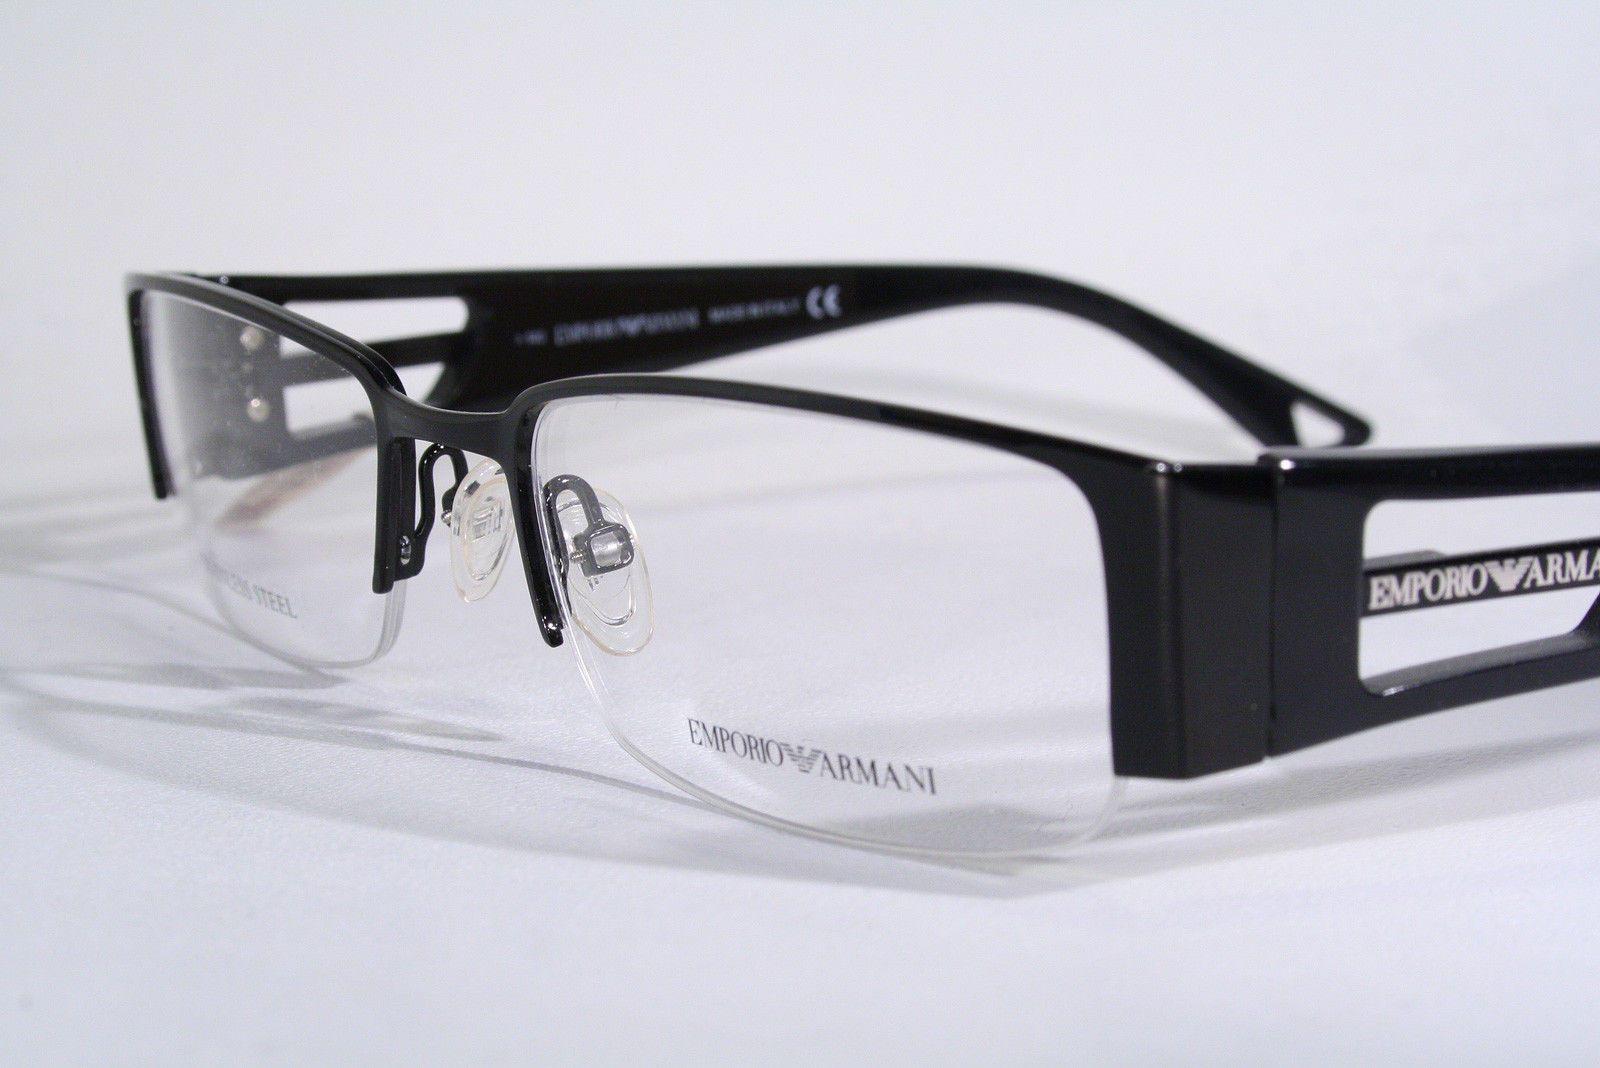 EMPORIO ARMANI New Half Rimless Black Rectangular Eyeglass Frames ...